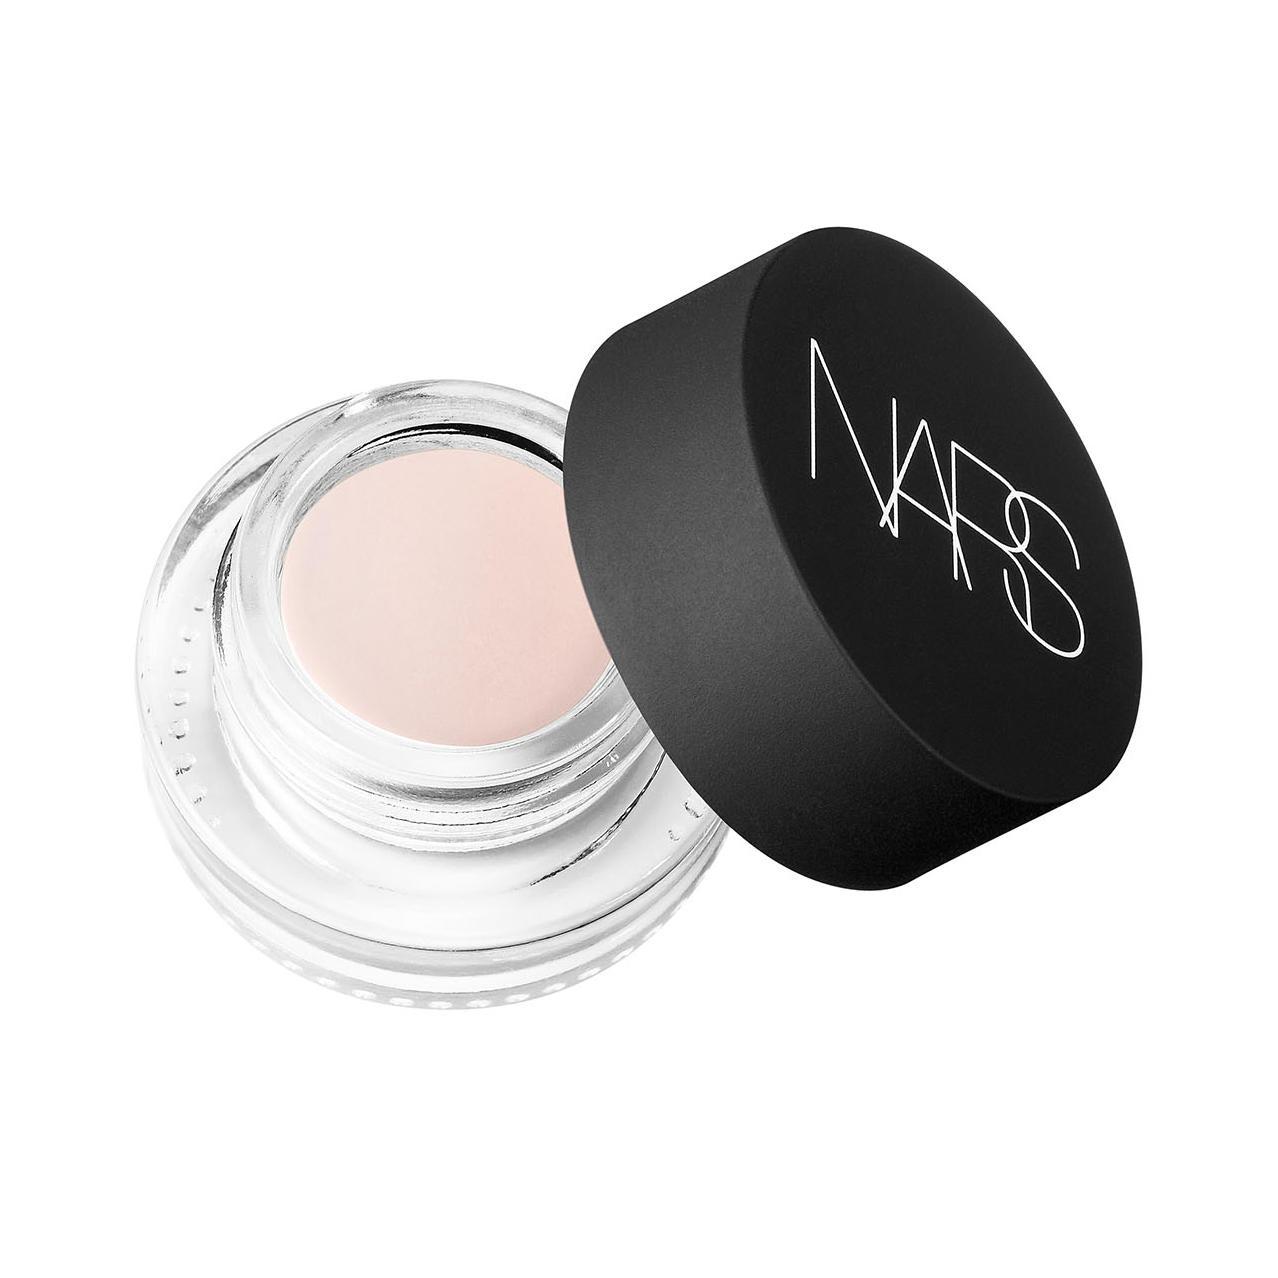 NARS Eye Paint Porto Venere